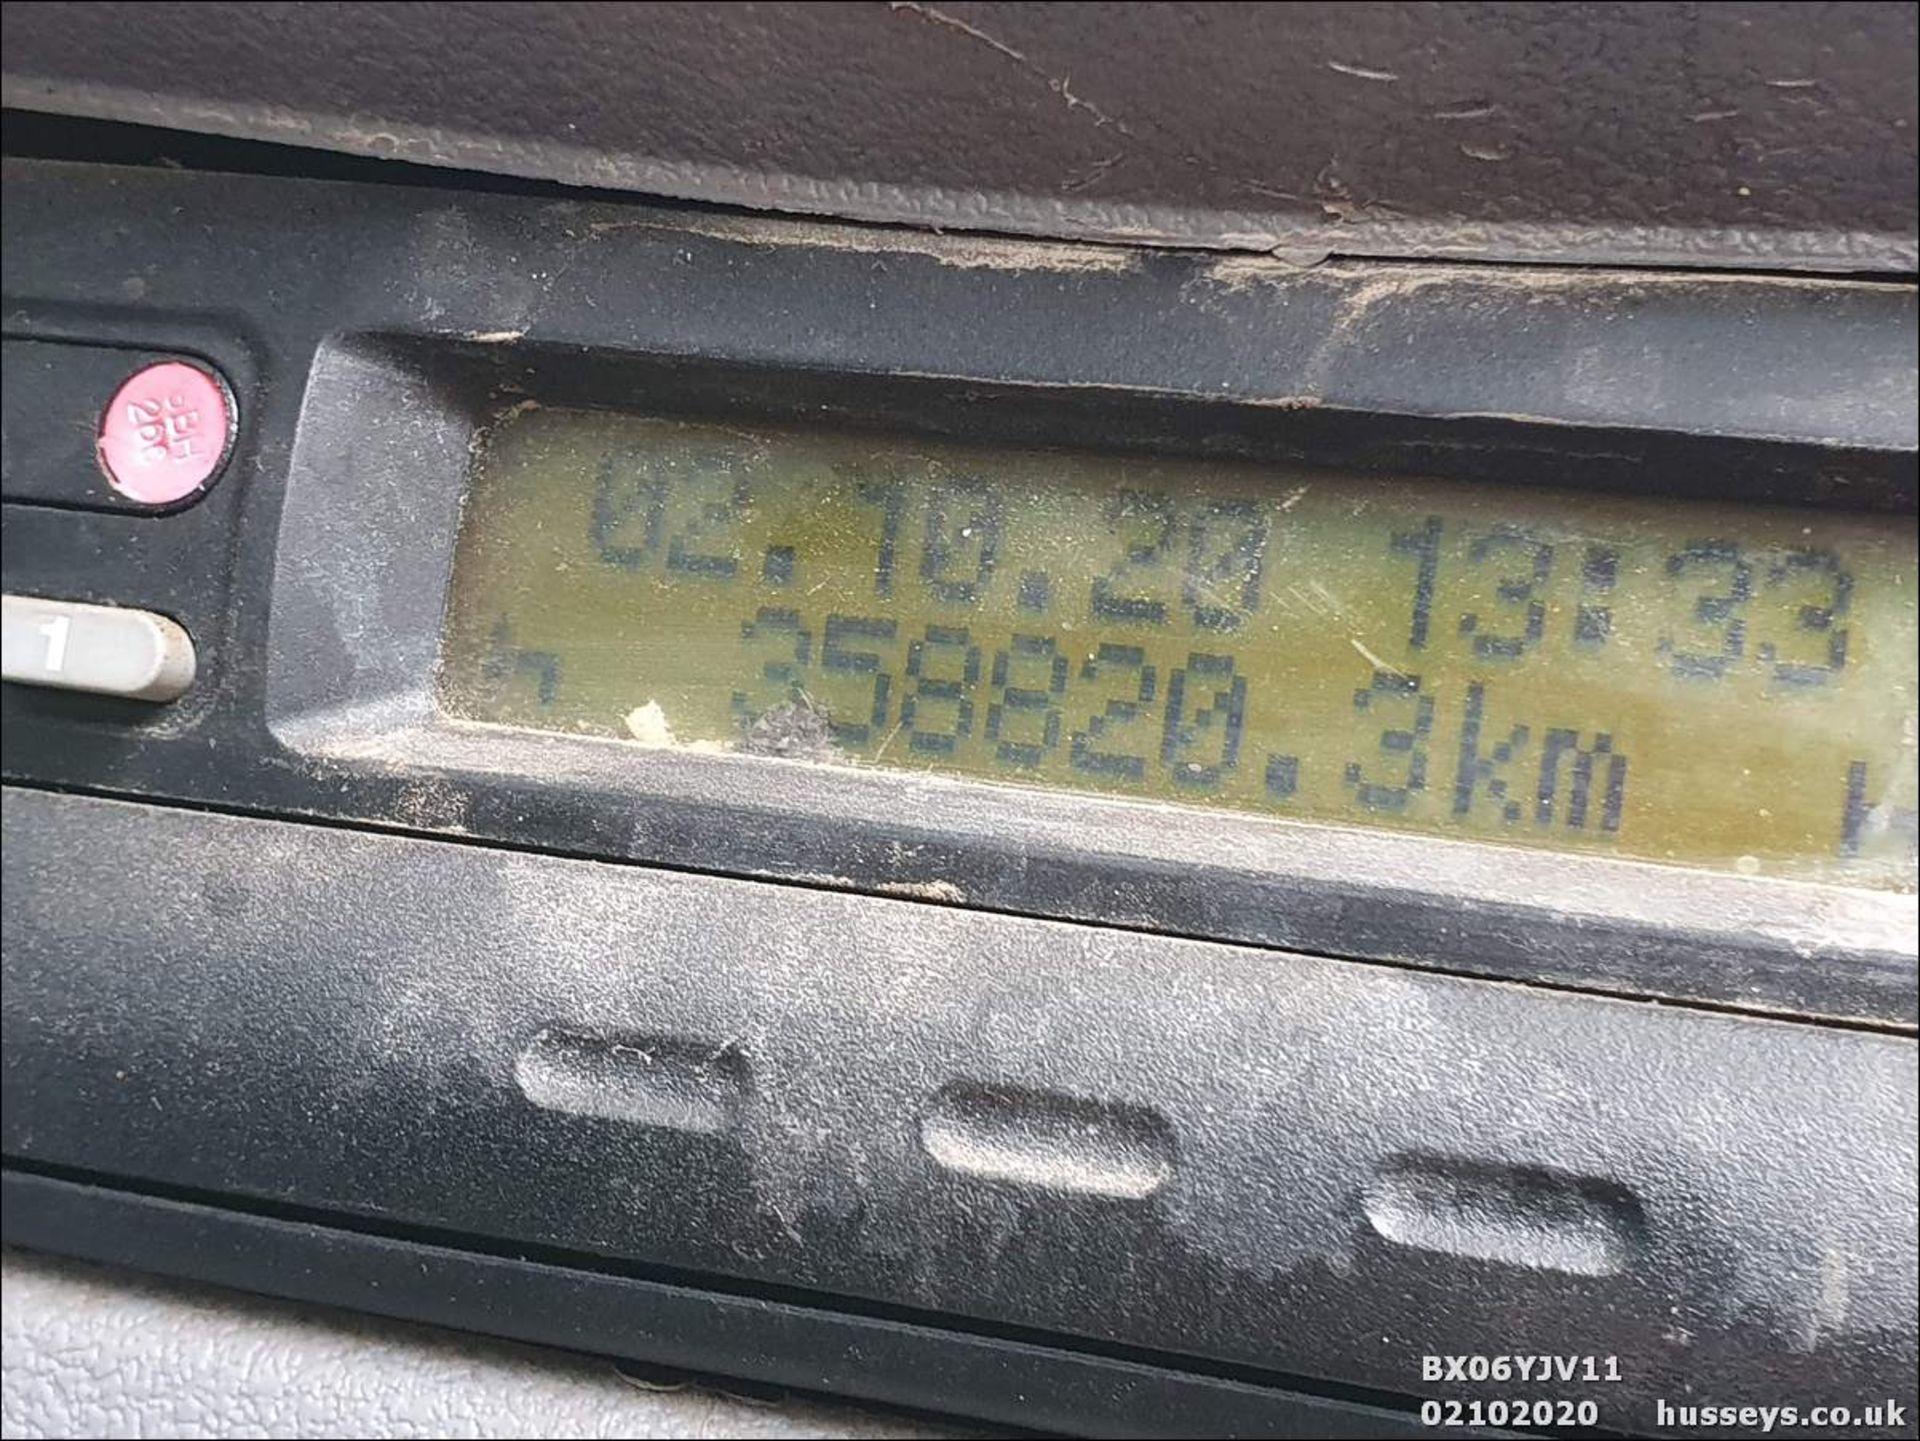 06/06 DAF TRUCKS FA LF55.220 HOTBOX - 5880cc (White, 358k) - Image 9 of 10